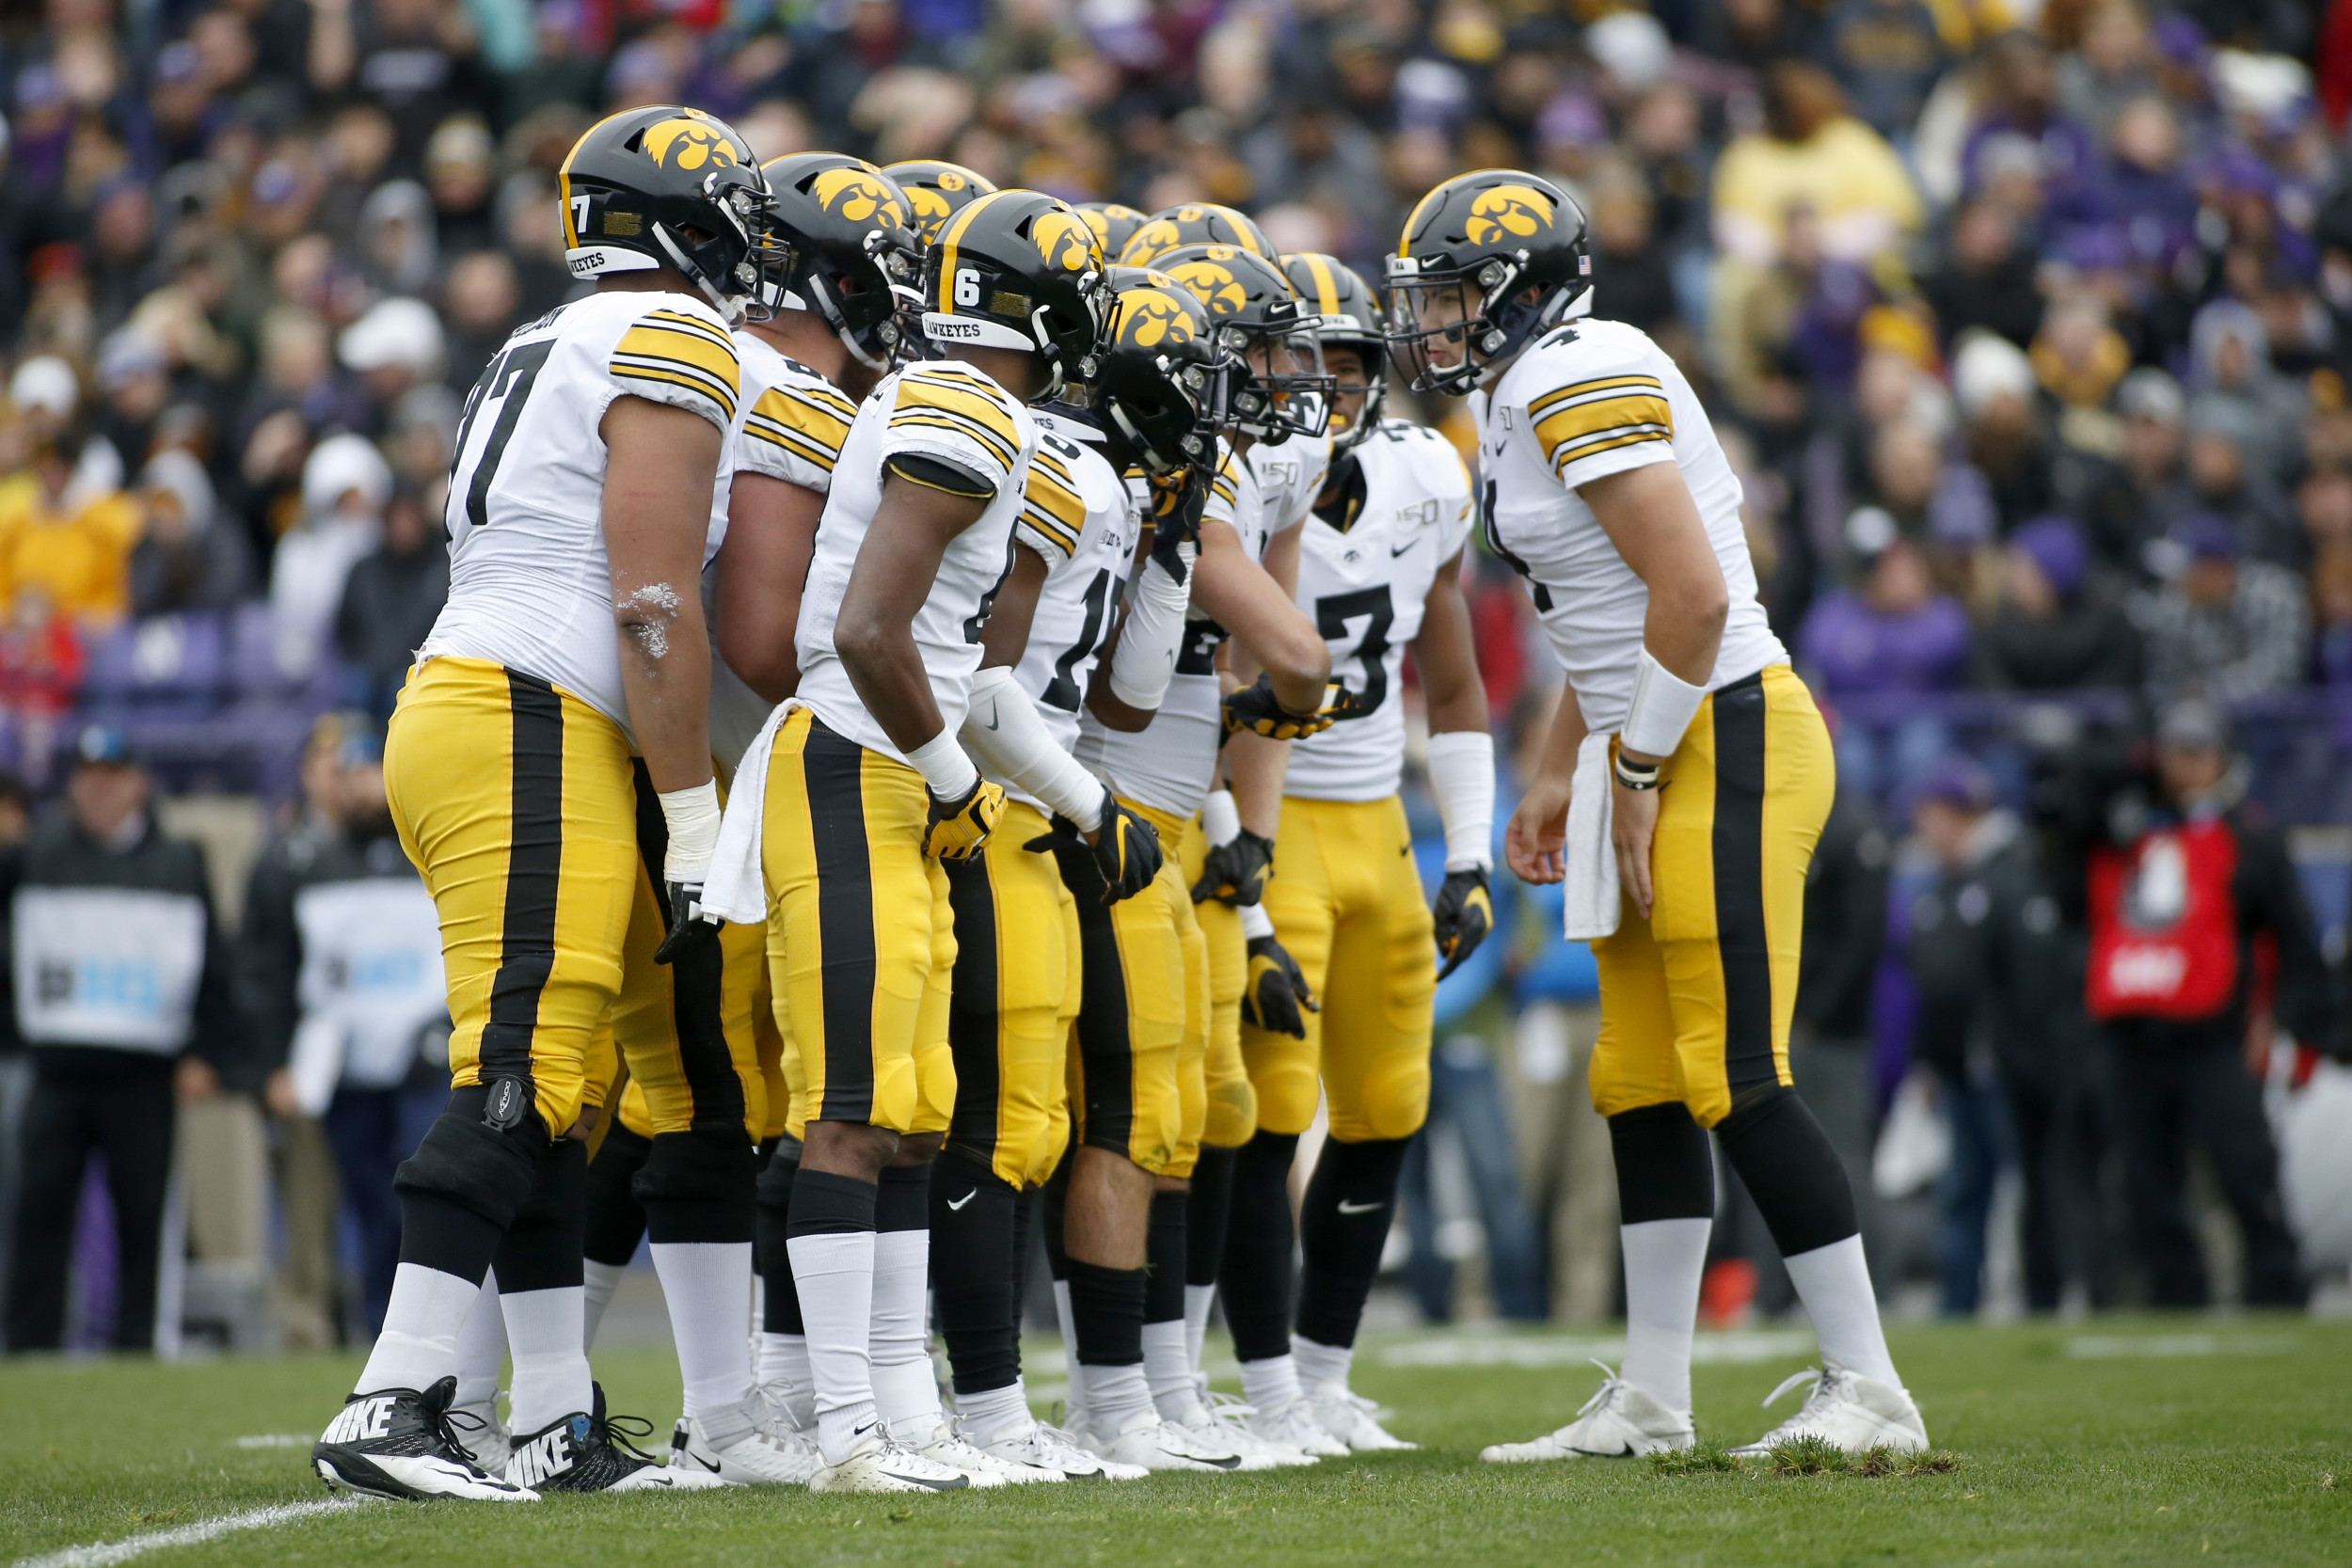 College Football Tv Schedule 2019 Where To Watch Iowa Vs